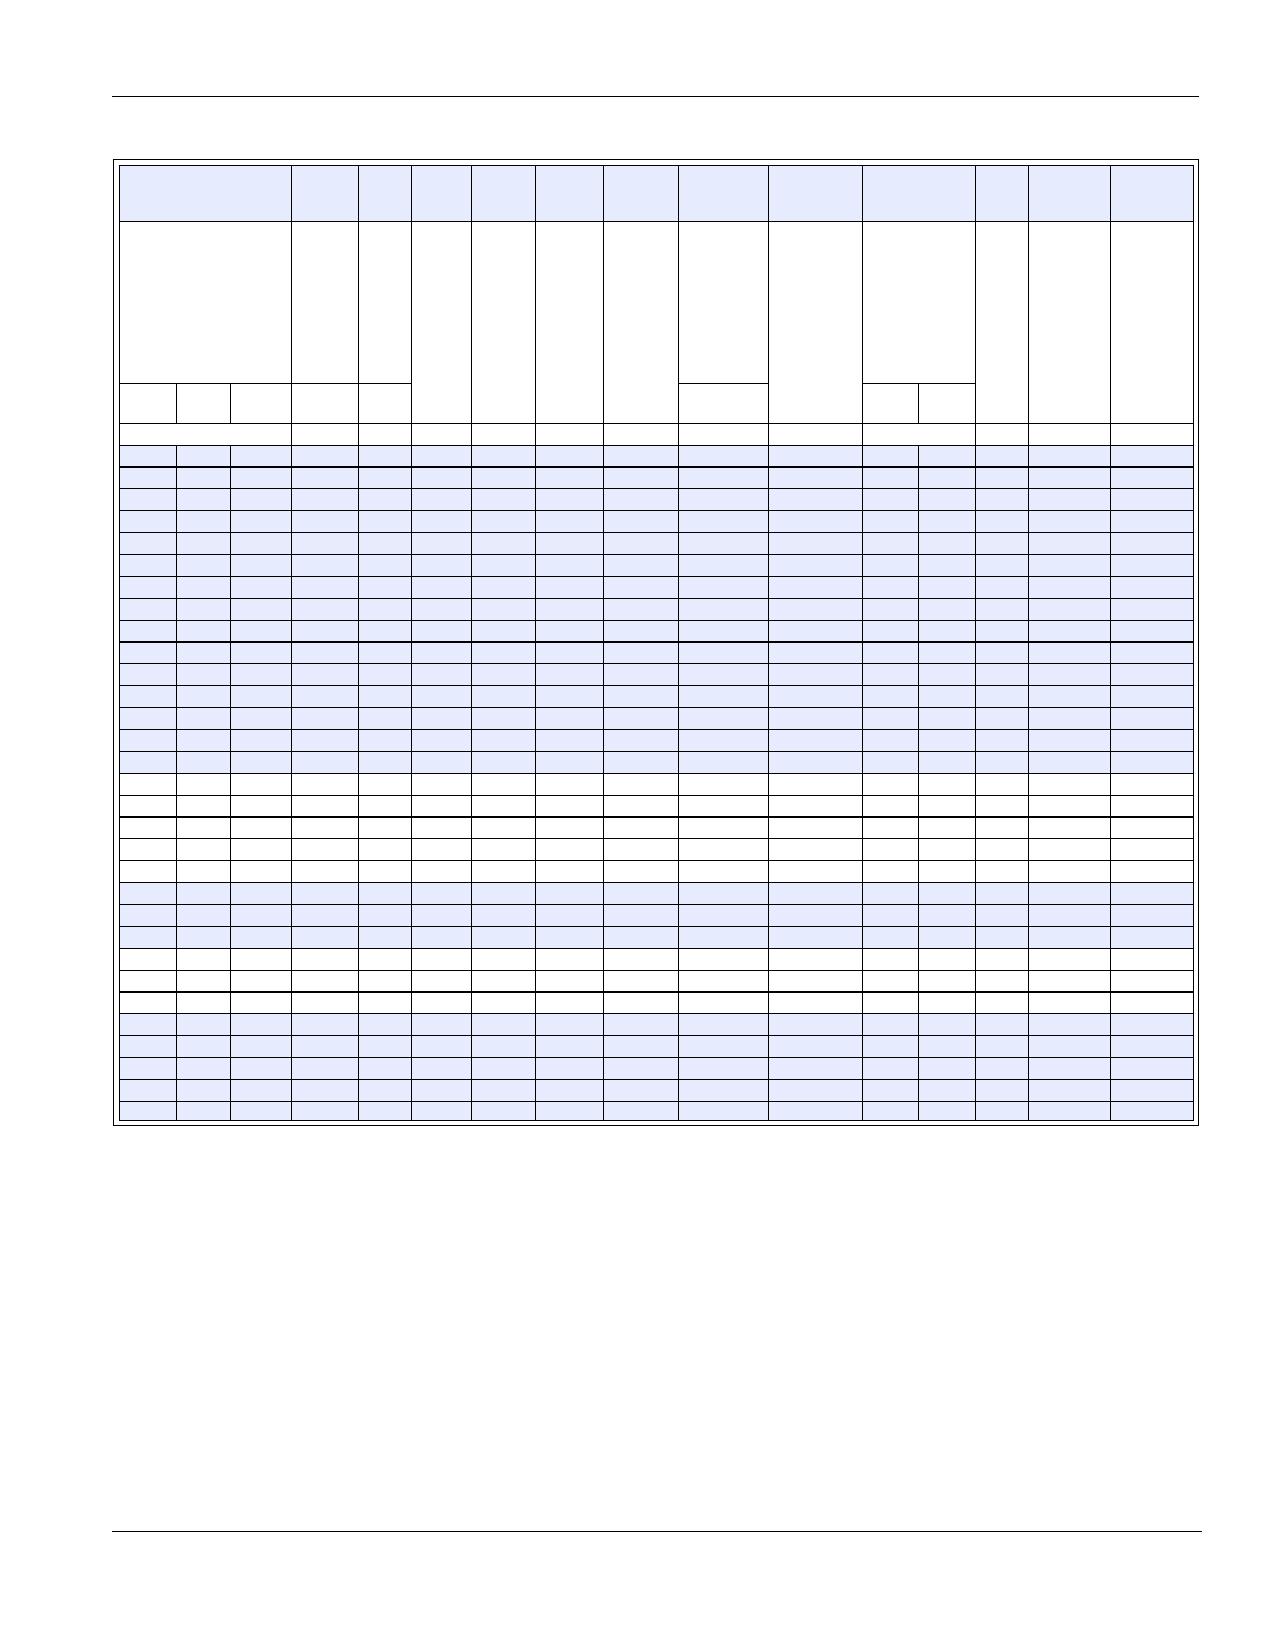 Q2010LH5 pdf